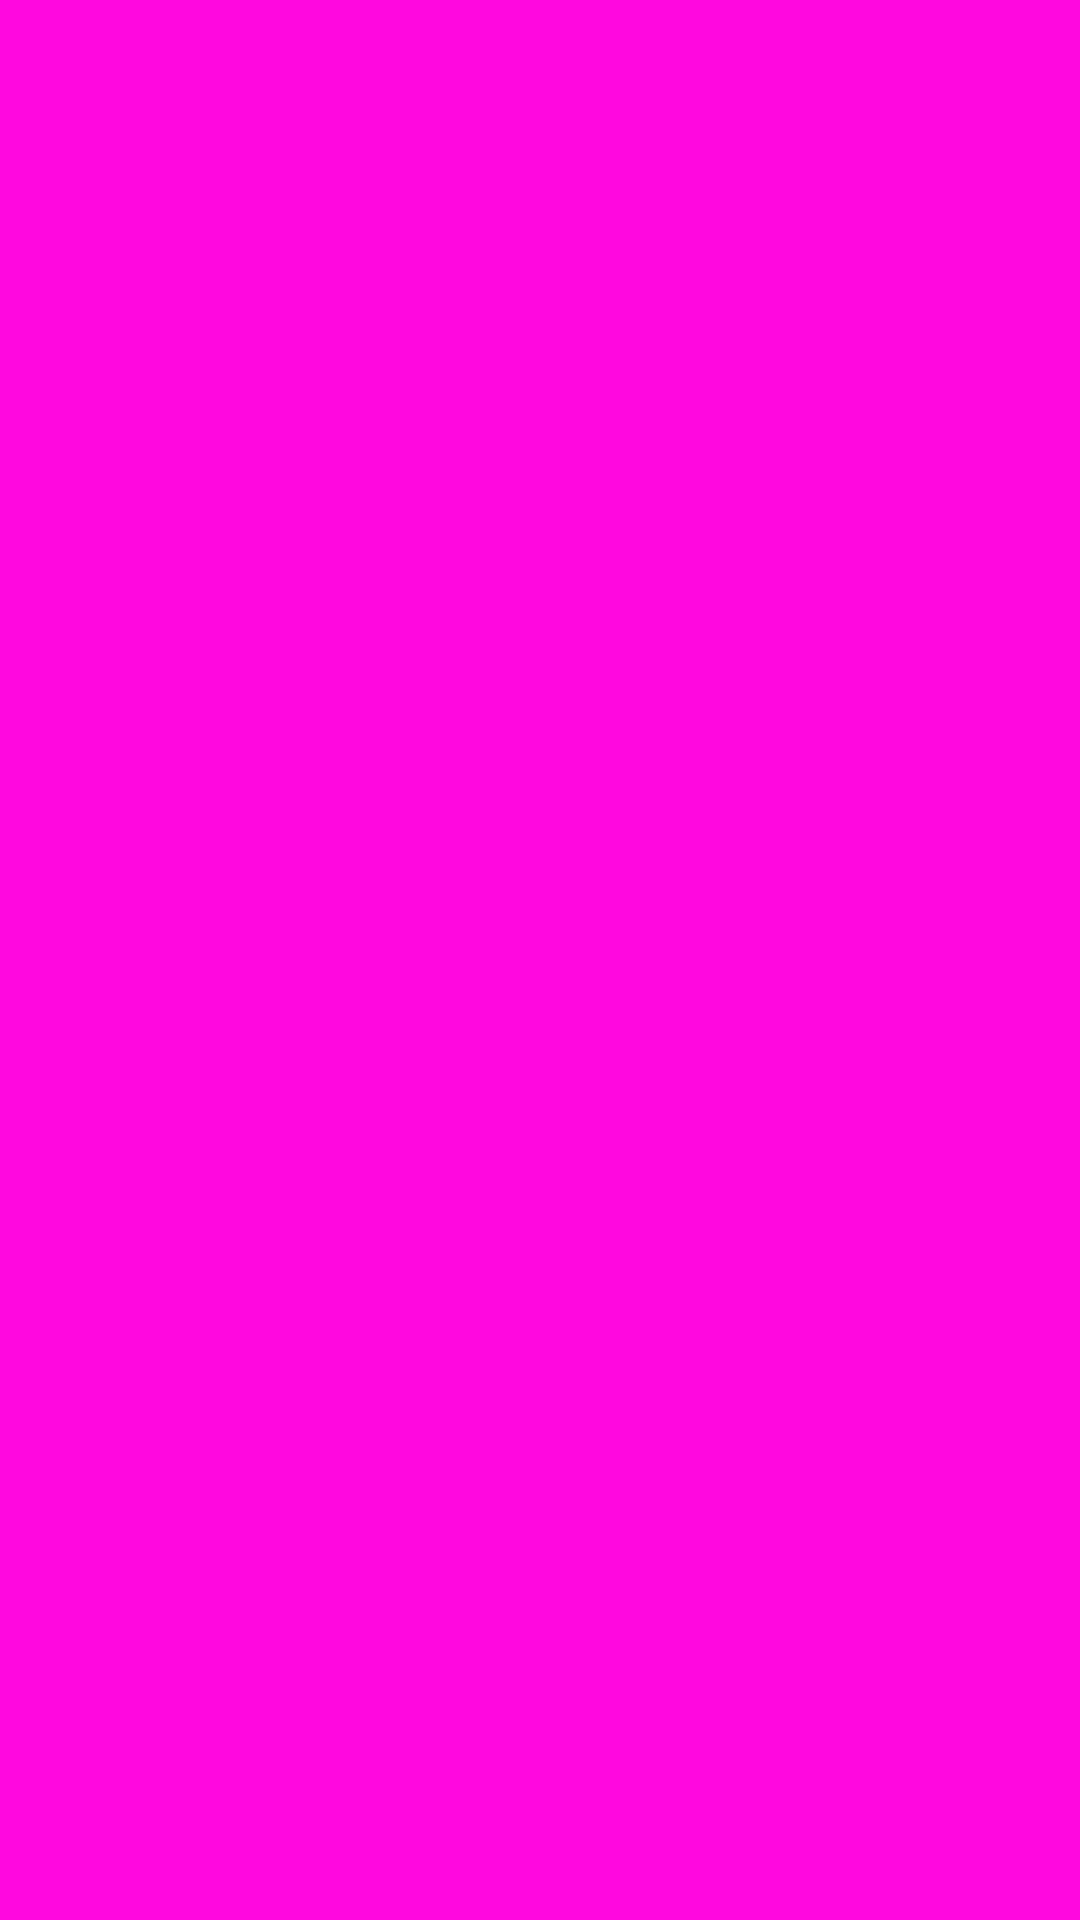 Ff08df Solid Color Image Solidcolore